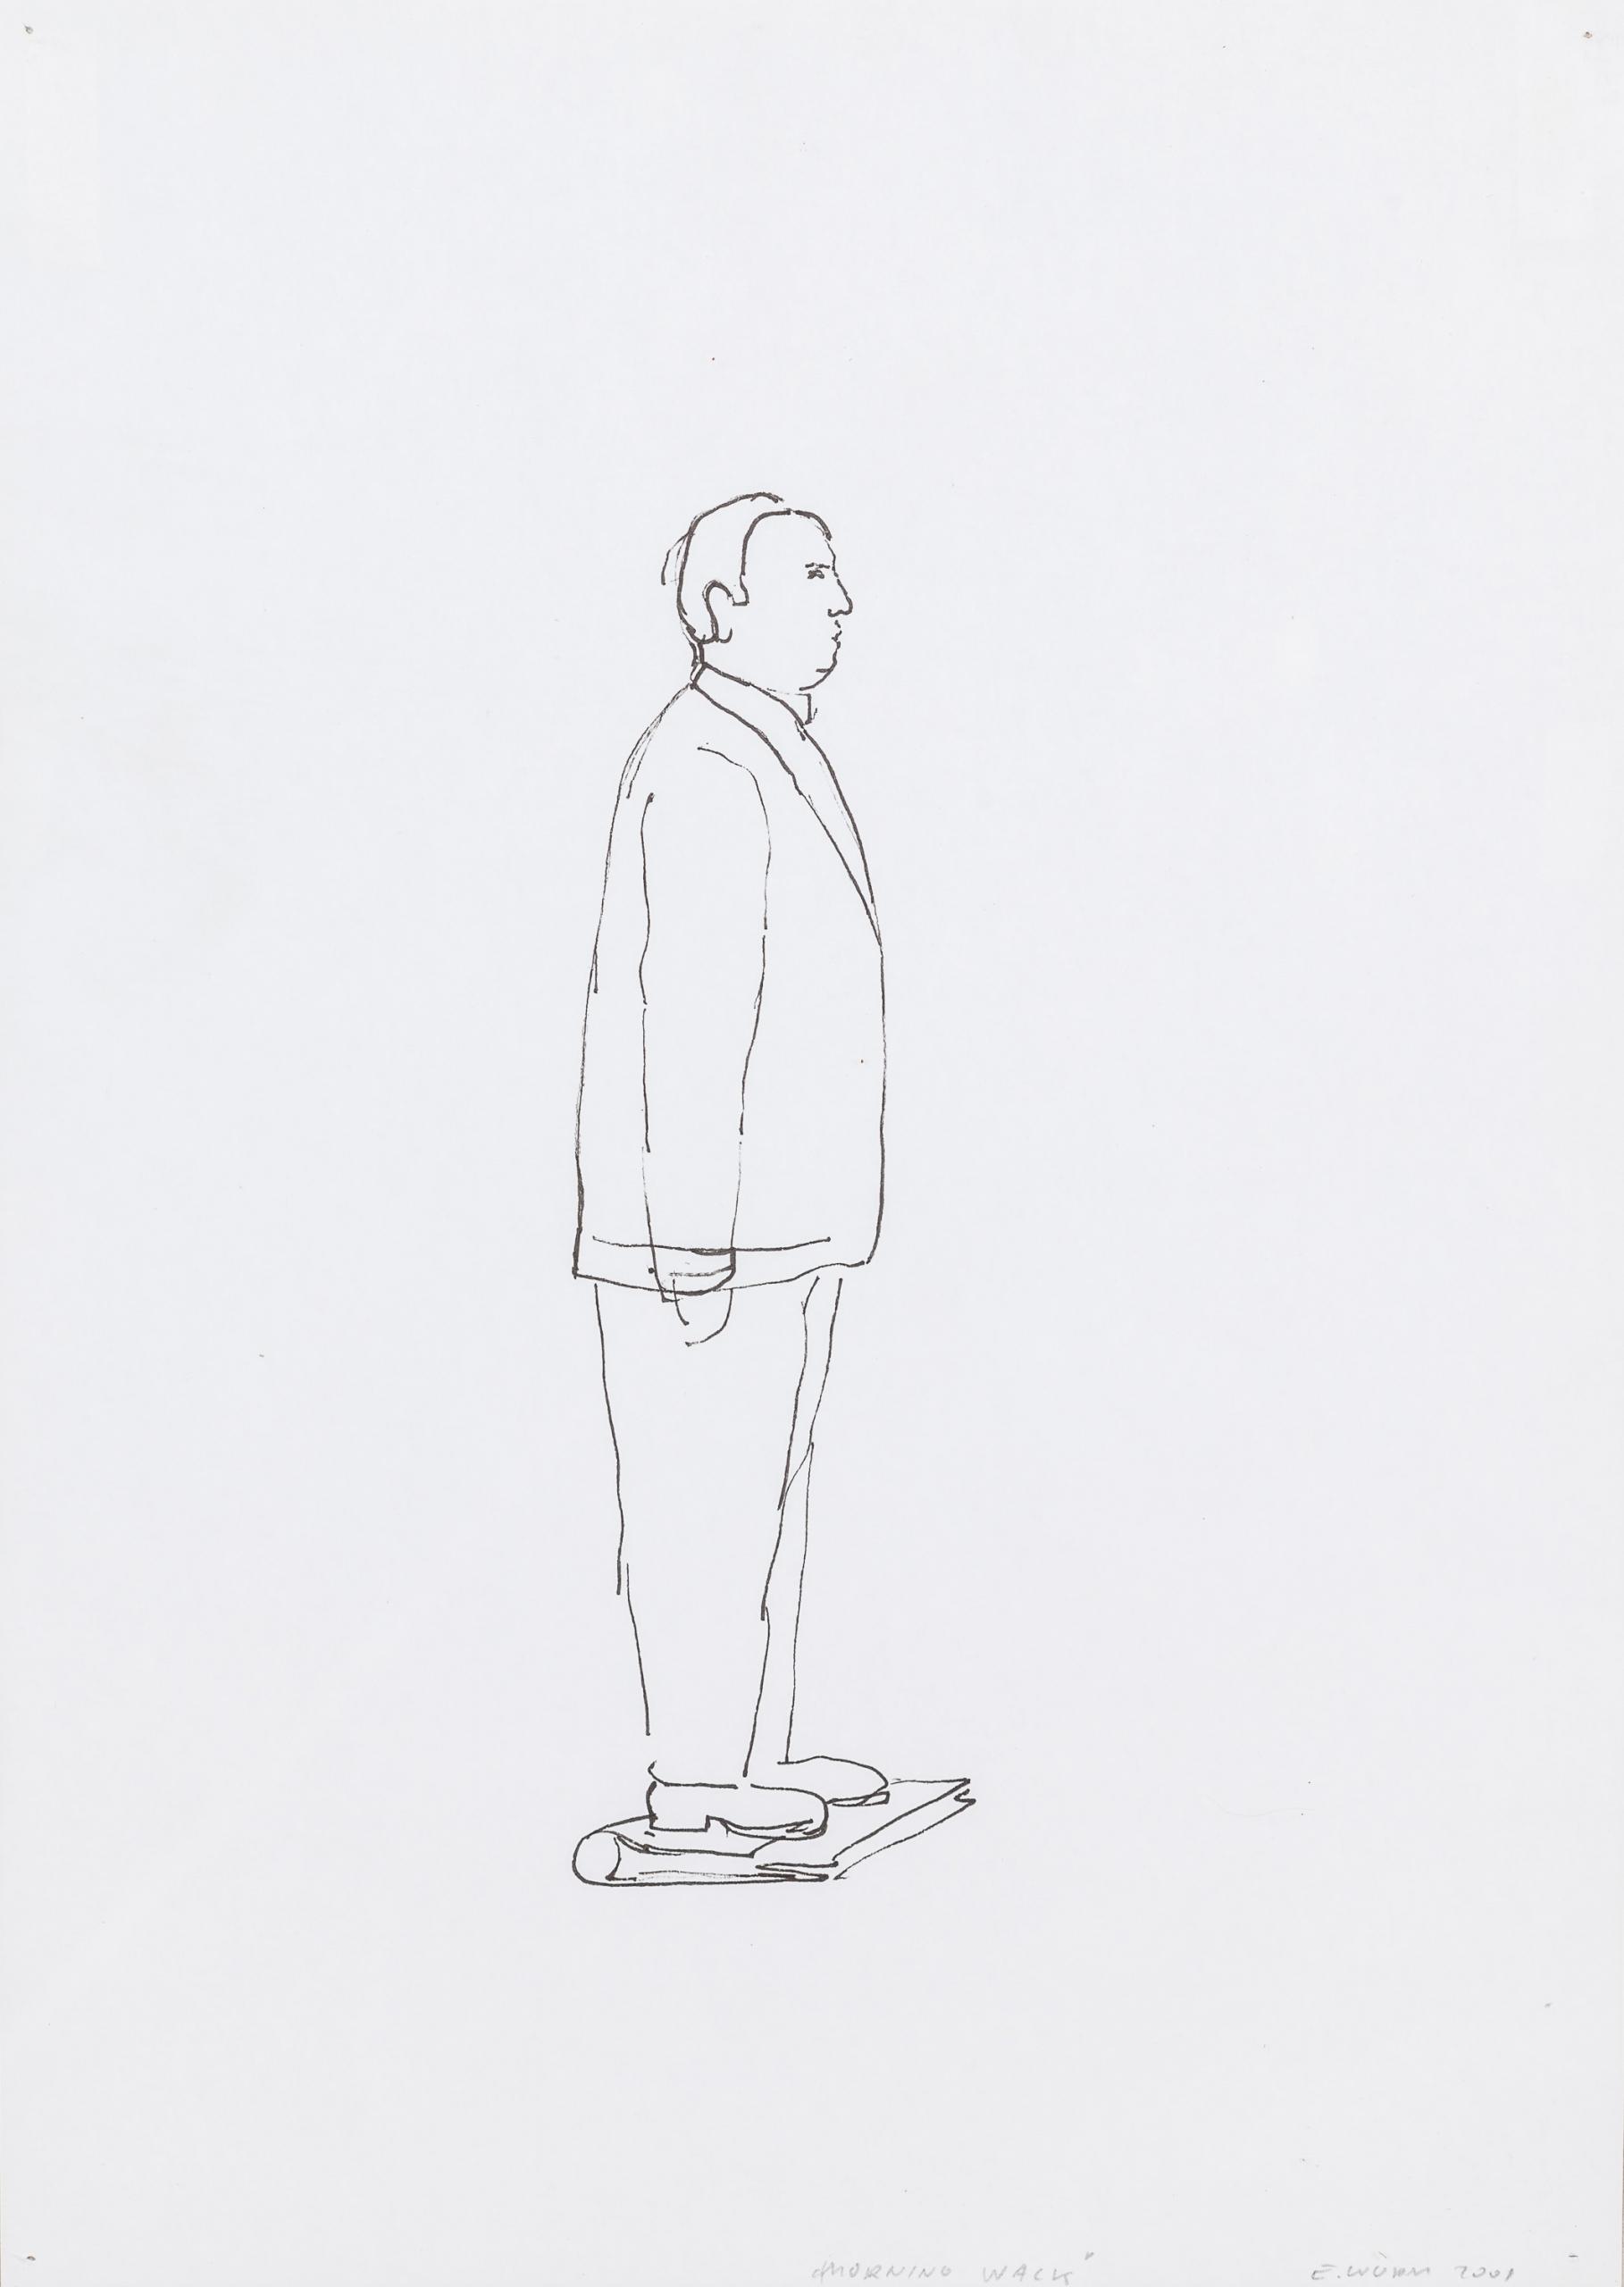 Erwin Wurm, Morning Wack